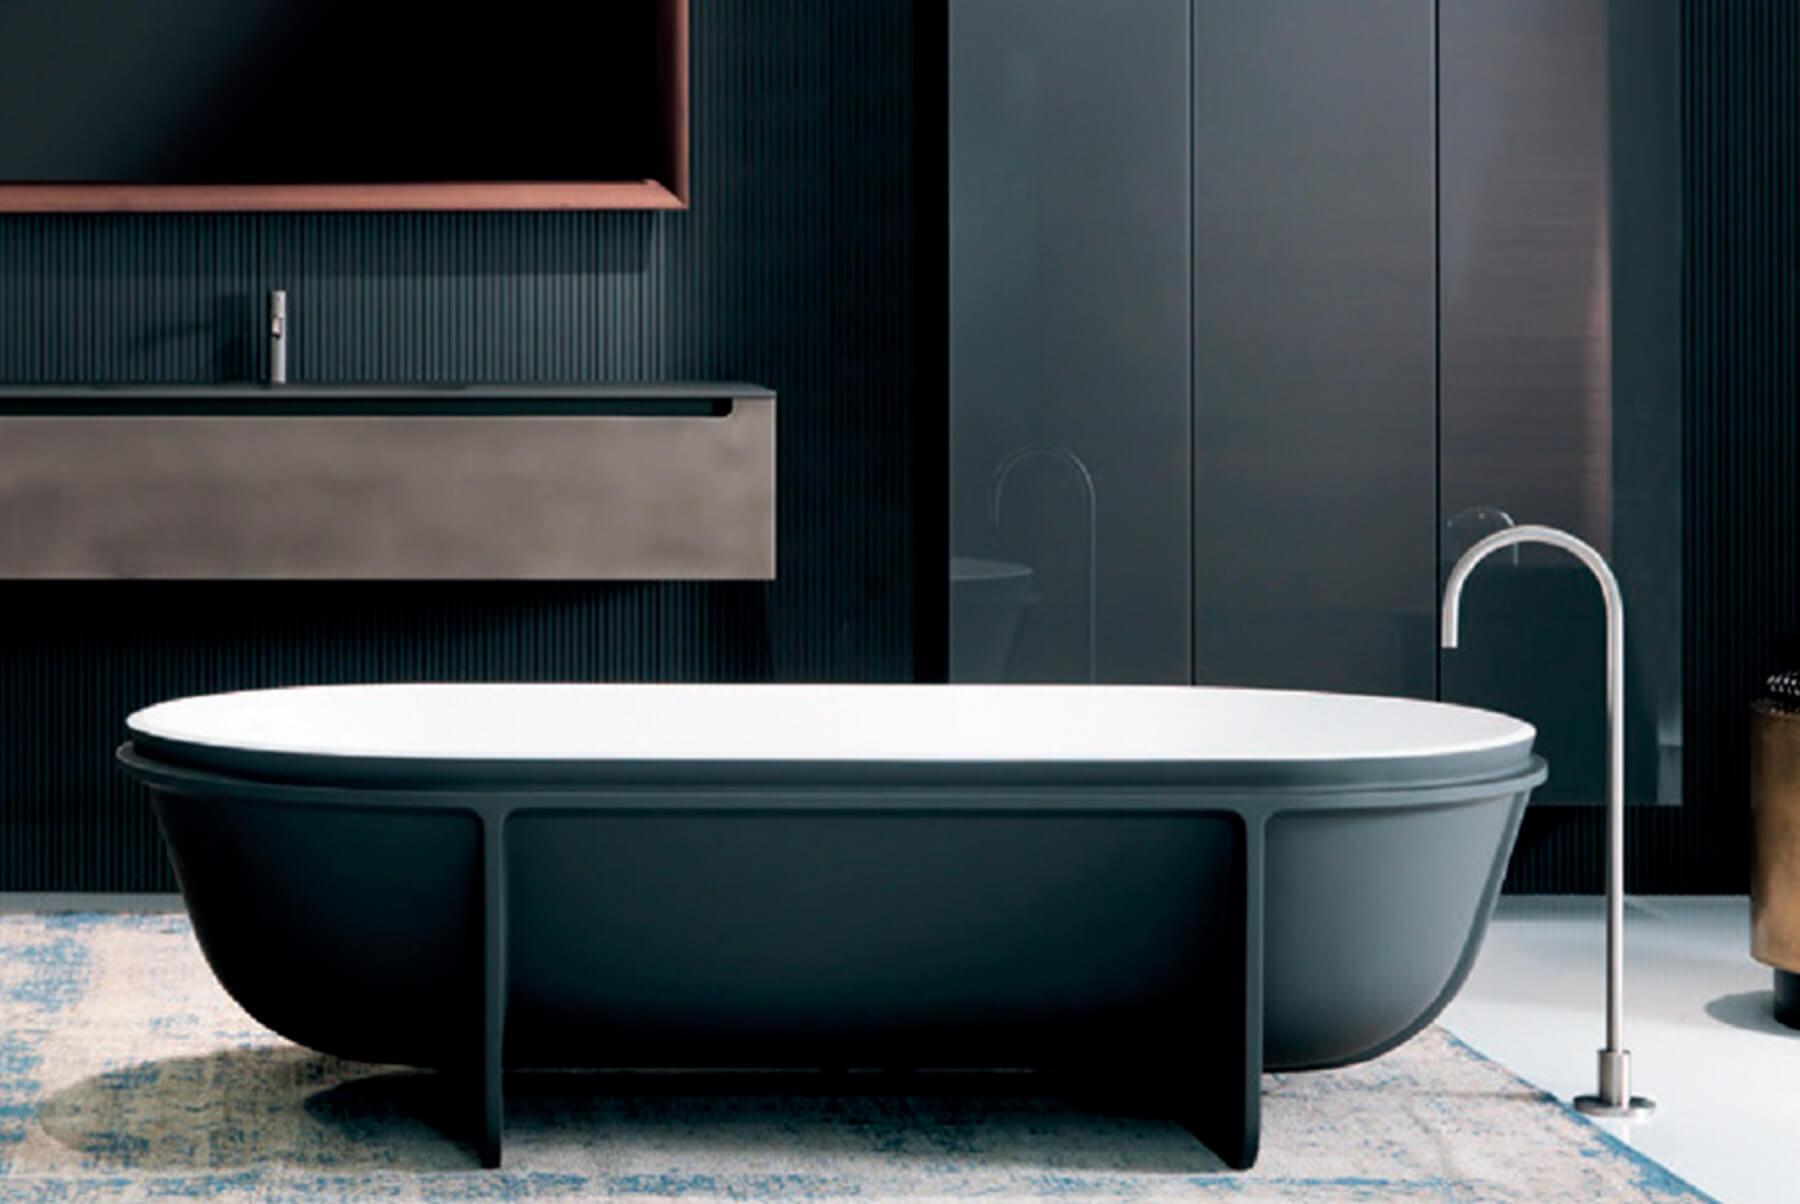 Bath-Tubs-Falper-Controstampo-grey-1800x1204